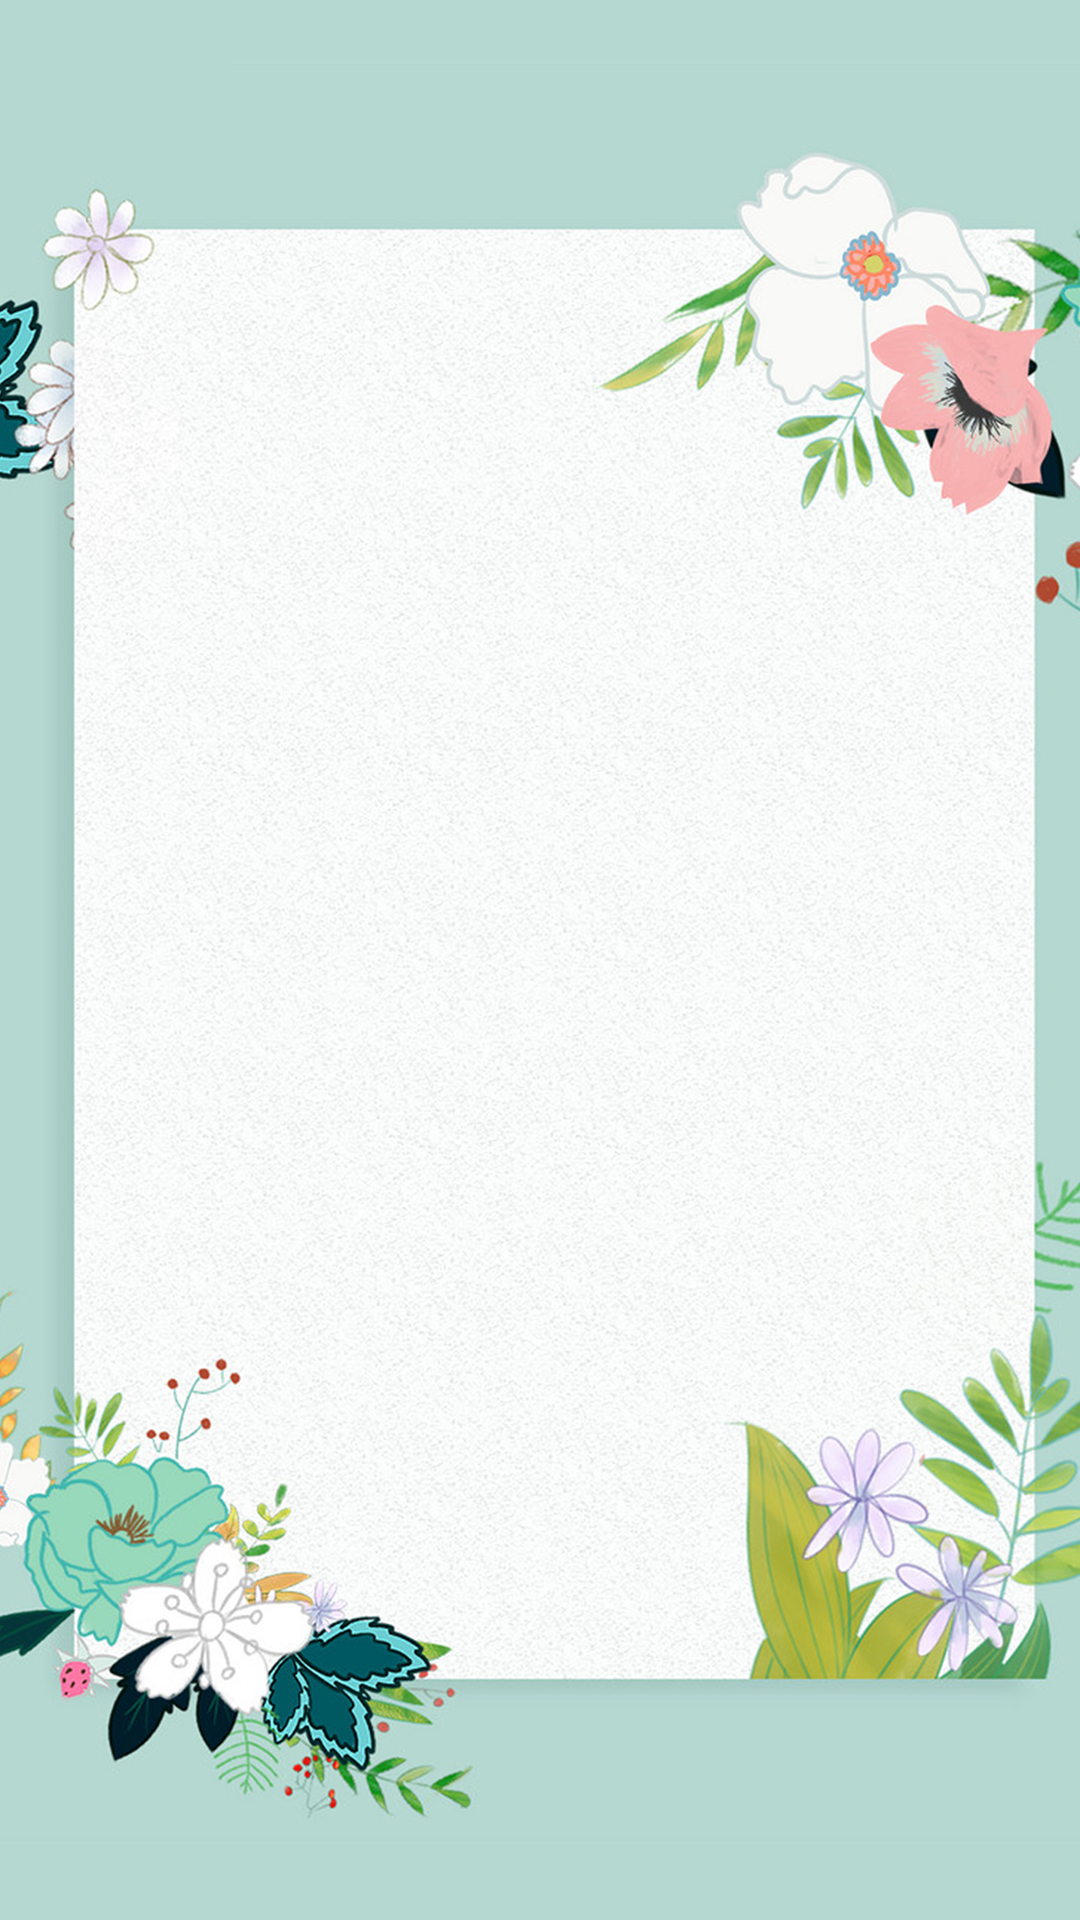 small fresh flower border background h5  flower  border  frame background image for free download